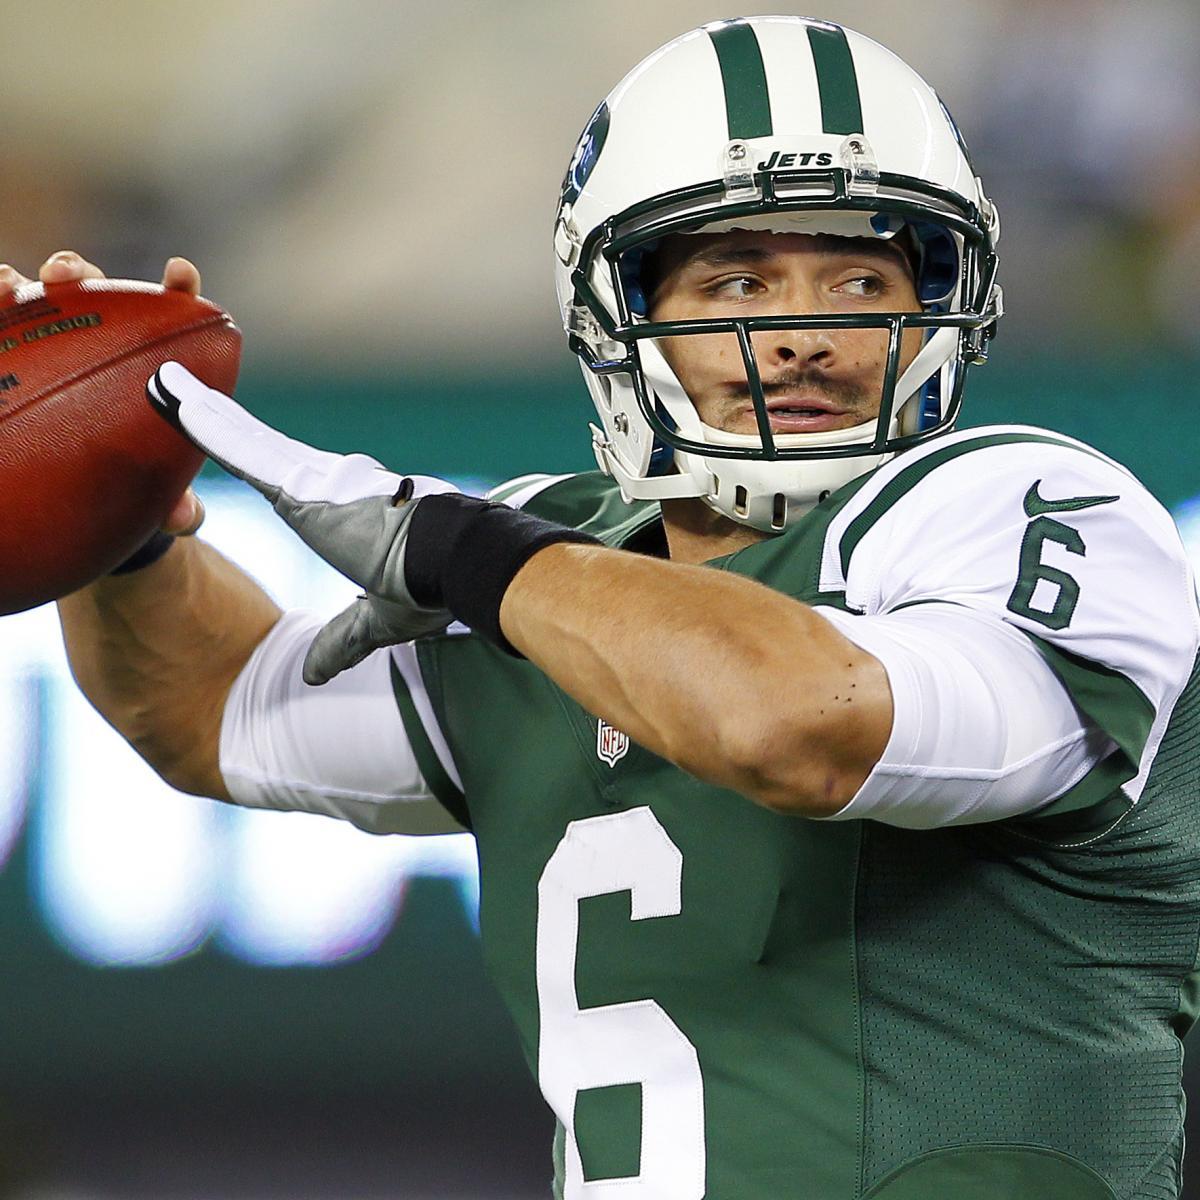 NY Jets quarterback Mark Sanchez says hes not concerned